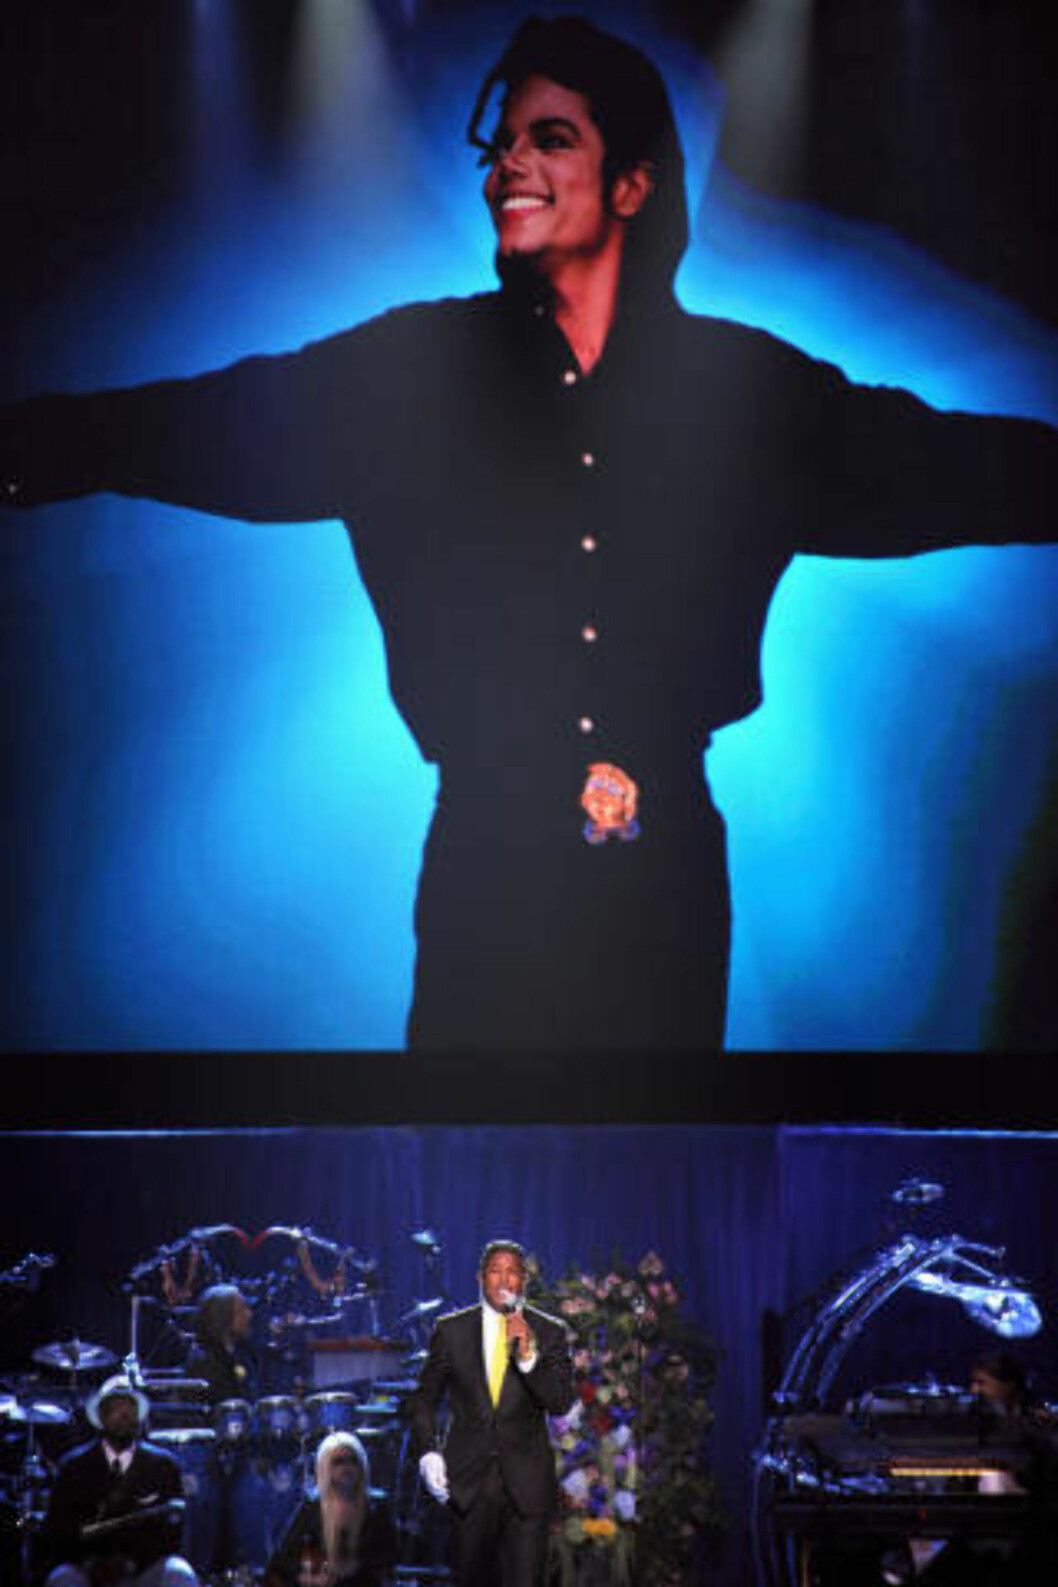 <strong>MINNESTUND:</strong> Michael Jacksons bror, Jermaine Jackson, holder en tale under minnstunden på Staples Center i Los Angeles. Foto: AFP PHOTO/GABRIEL BOUYS/POOL/Scanpix